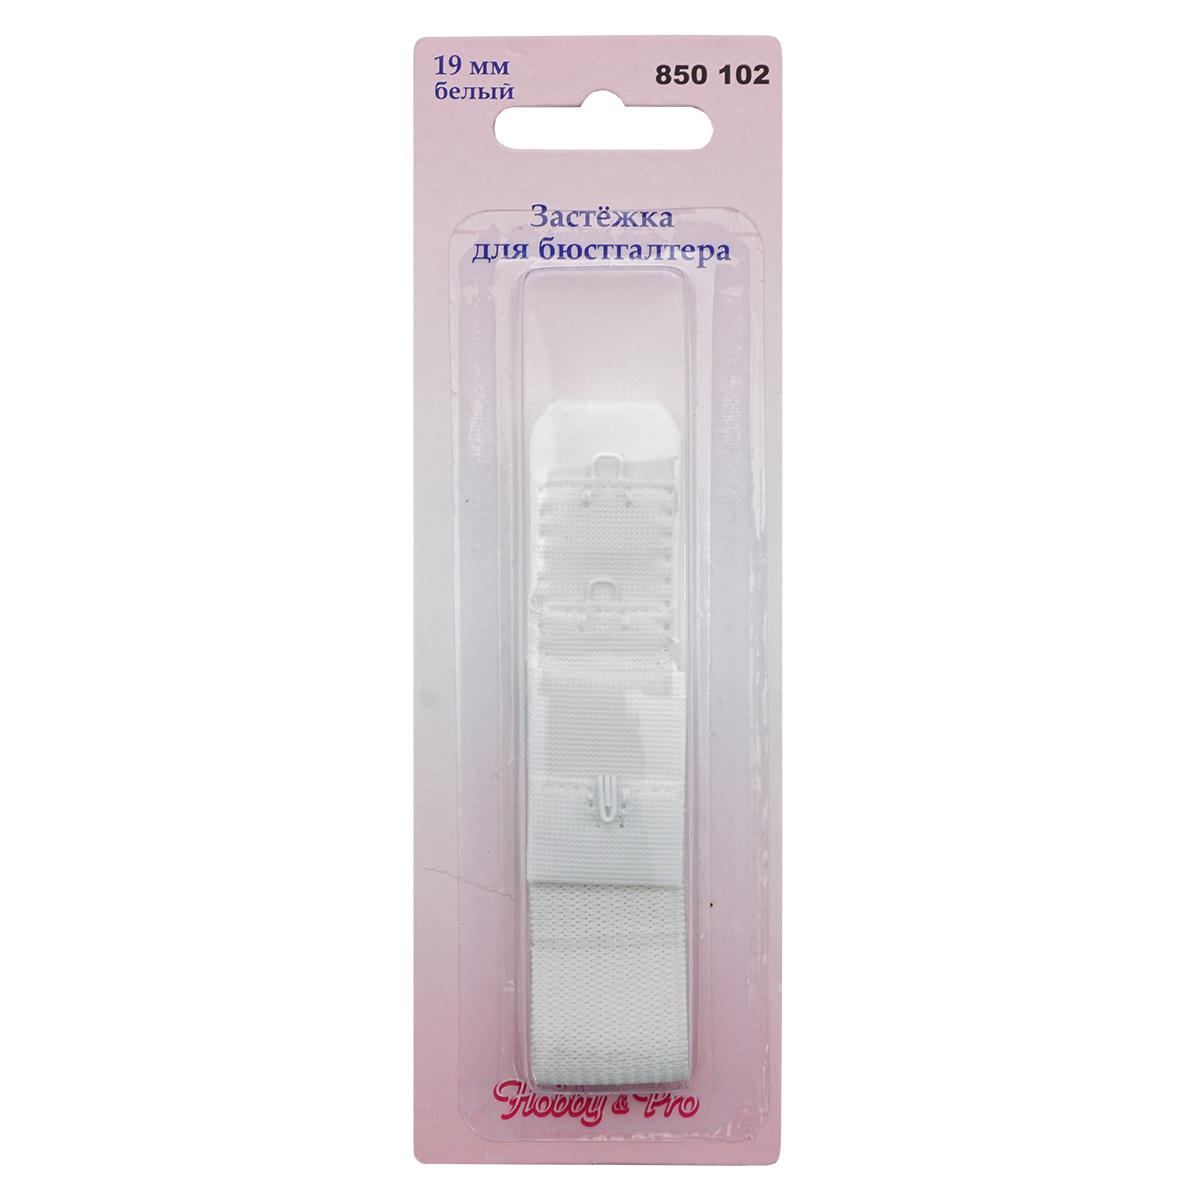 Застежка для бюстгальтера 19мм, 1 крючок, 1 шт., белый 850102, Hobby&Pro